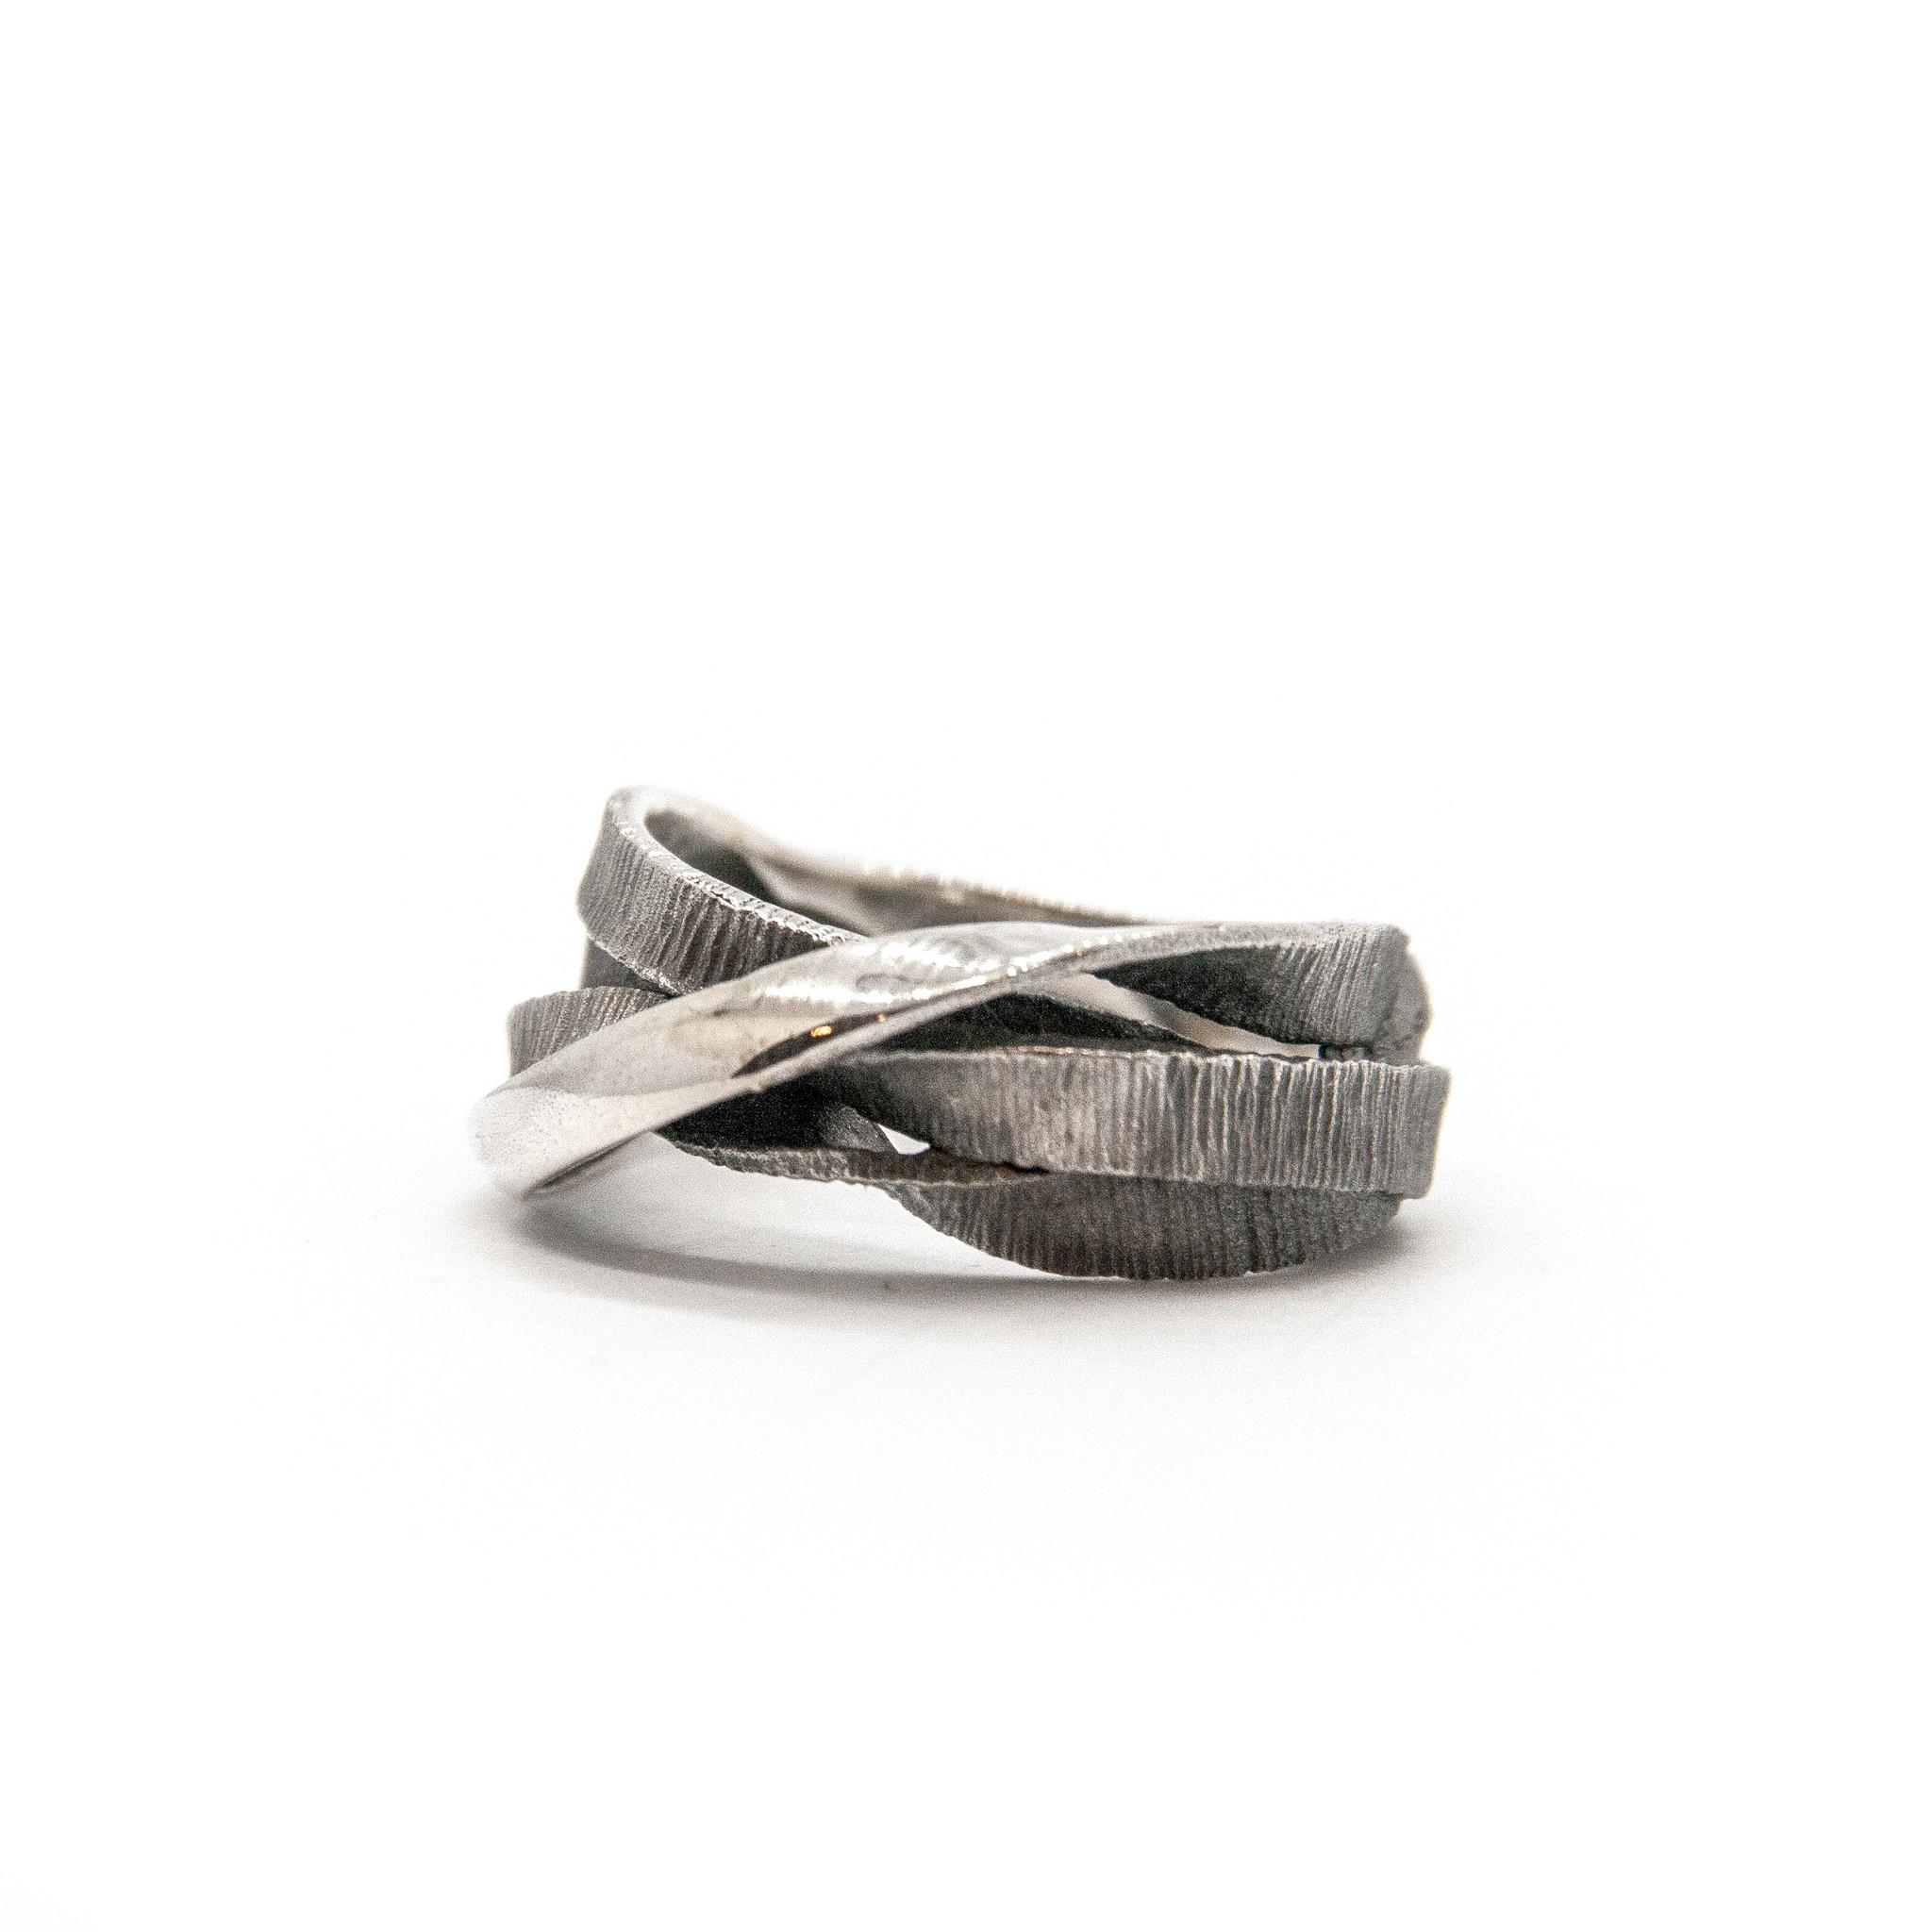 Moebius 3+1 ring-5